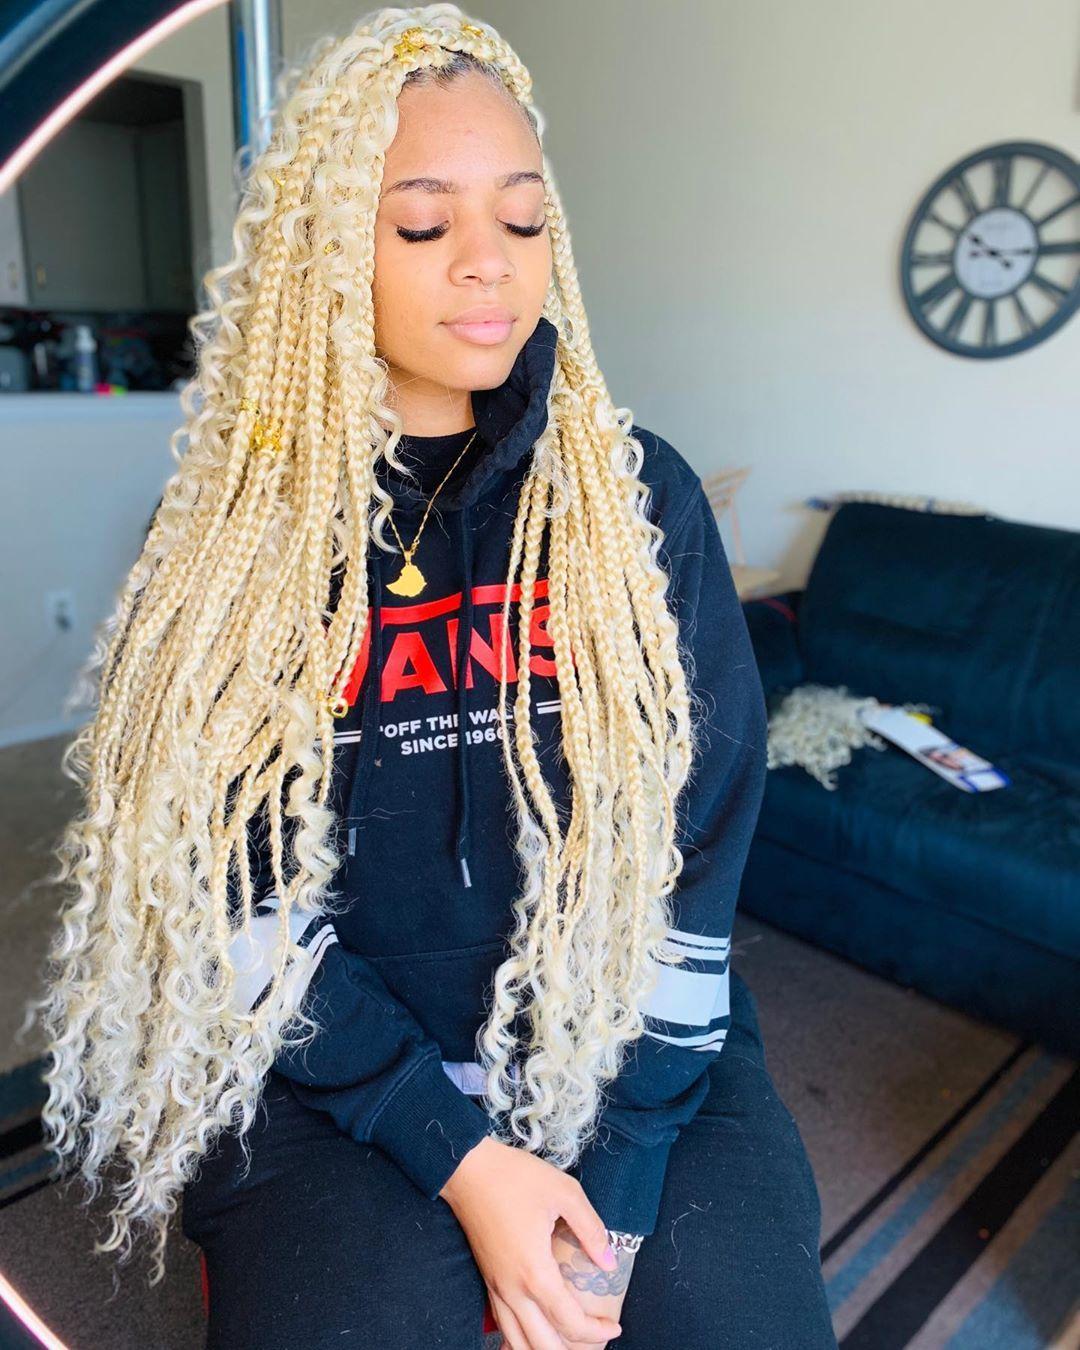 rocking the old school loose braid! yes! - #braid #loose #rocking #school - #HairstyleWavyBraid #loosebraids rocking the old school loose braid! yes! - #braid #loose #rocking #school - #HairstyleWavyBraid # loose Braids blonde